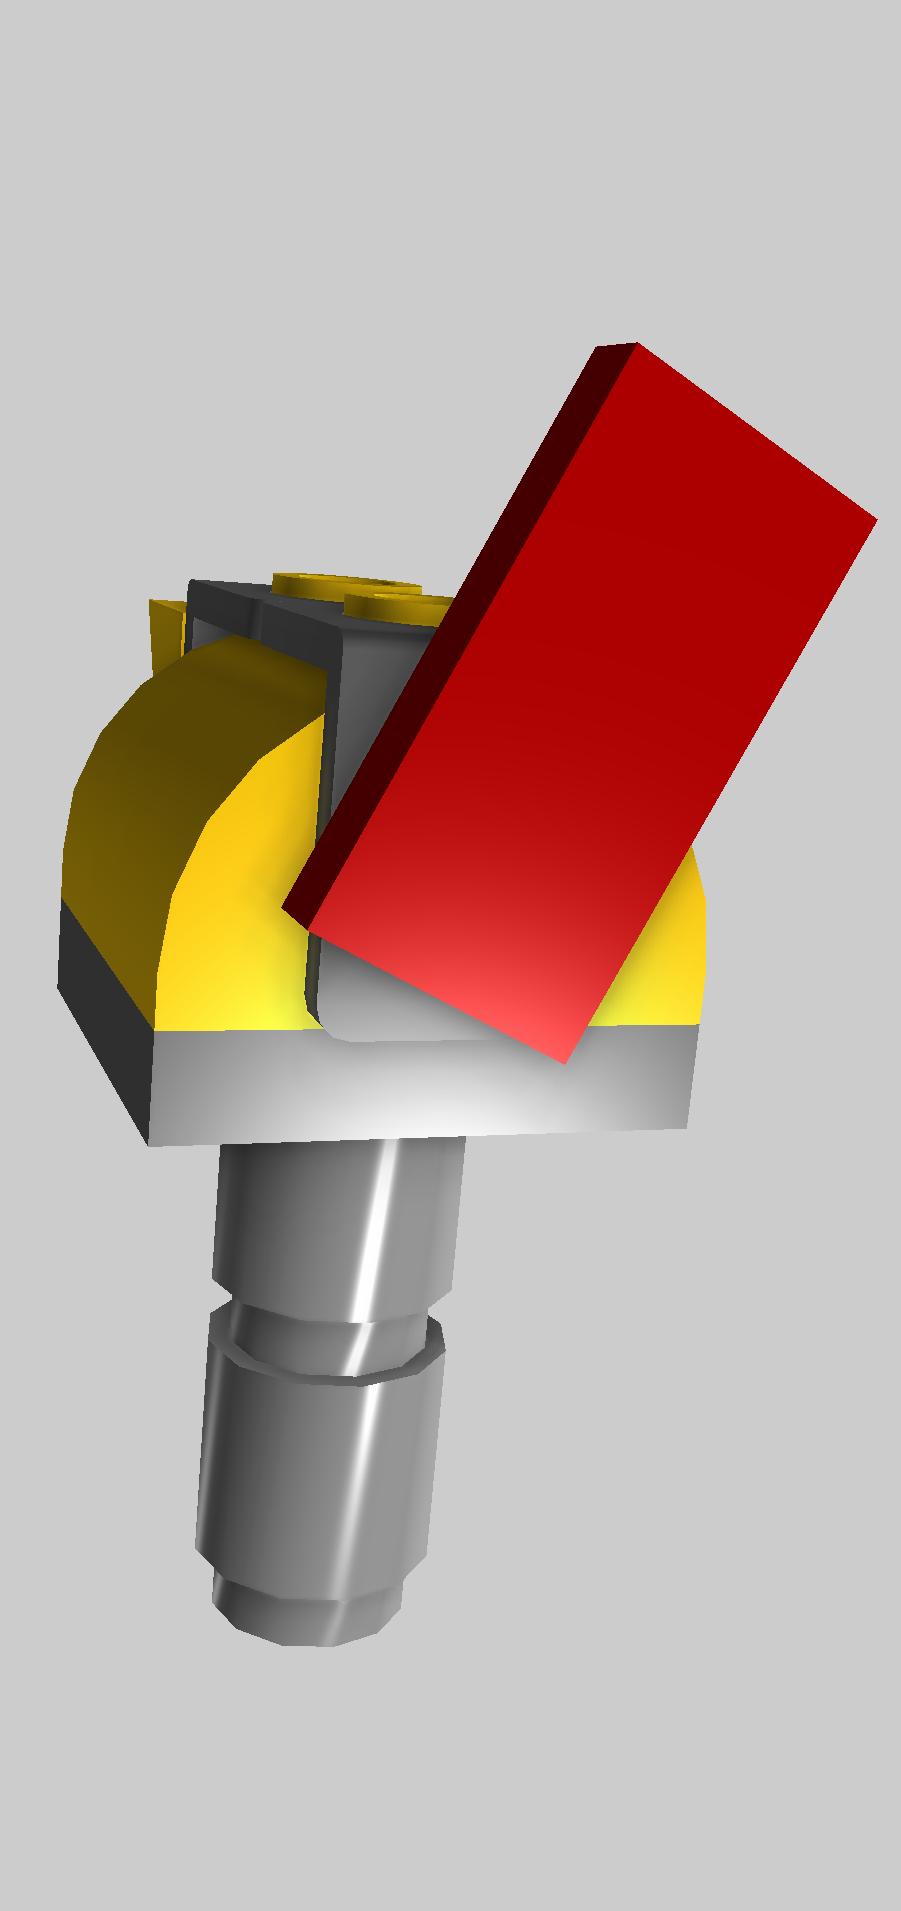 Lego universe wiki fandom. Mailbox clipart house mailbox